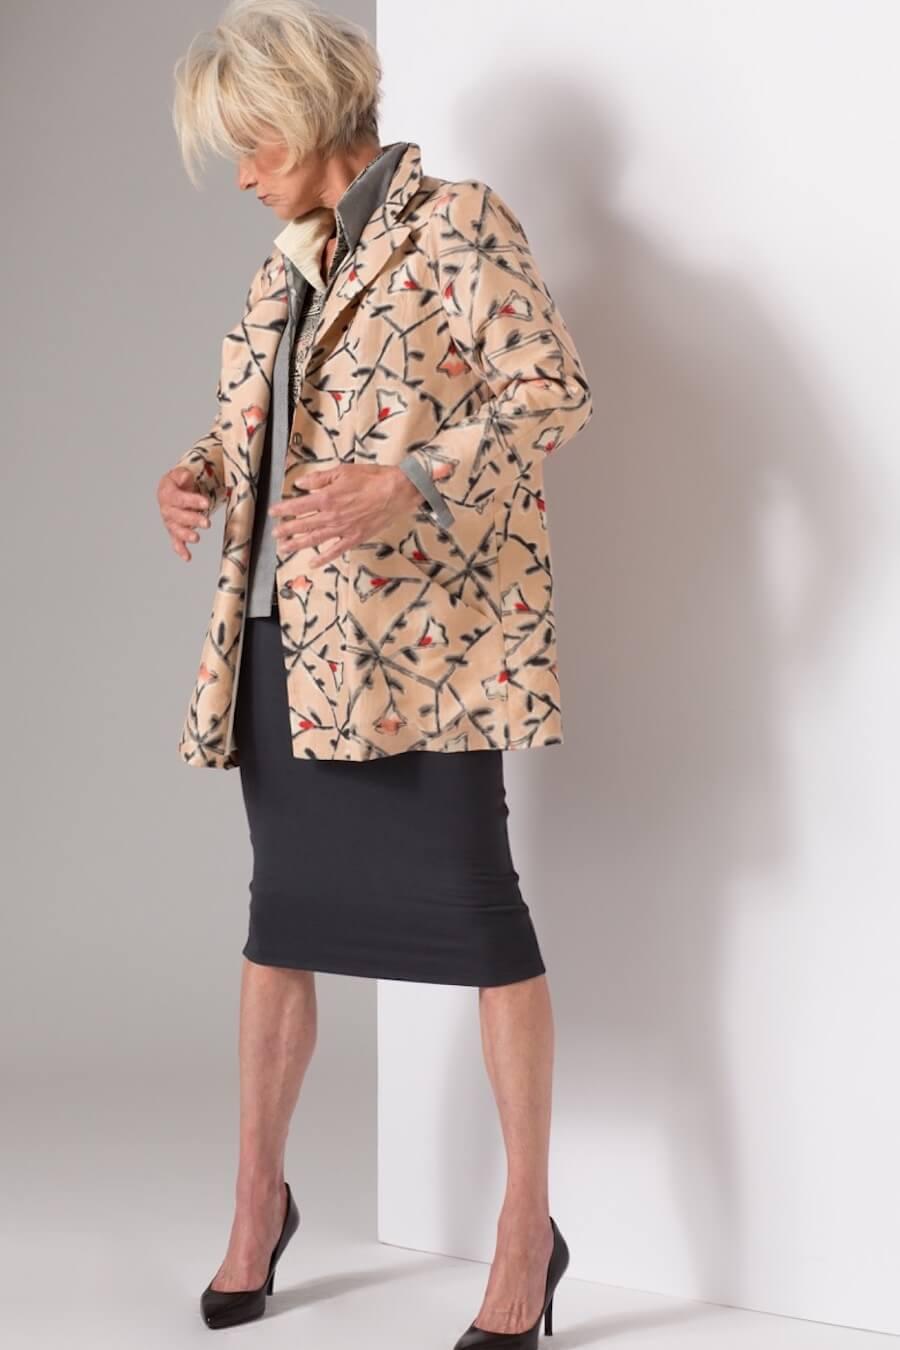 2 Hitoes with Peach Vines Trench — Vintage Kimono Silk | Ann Williamson